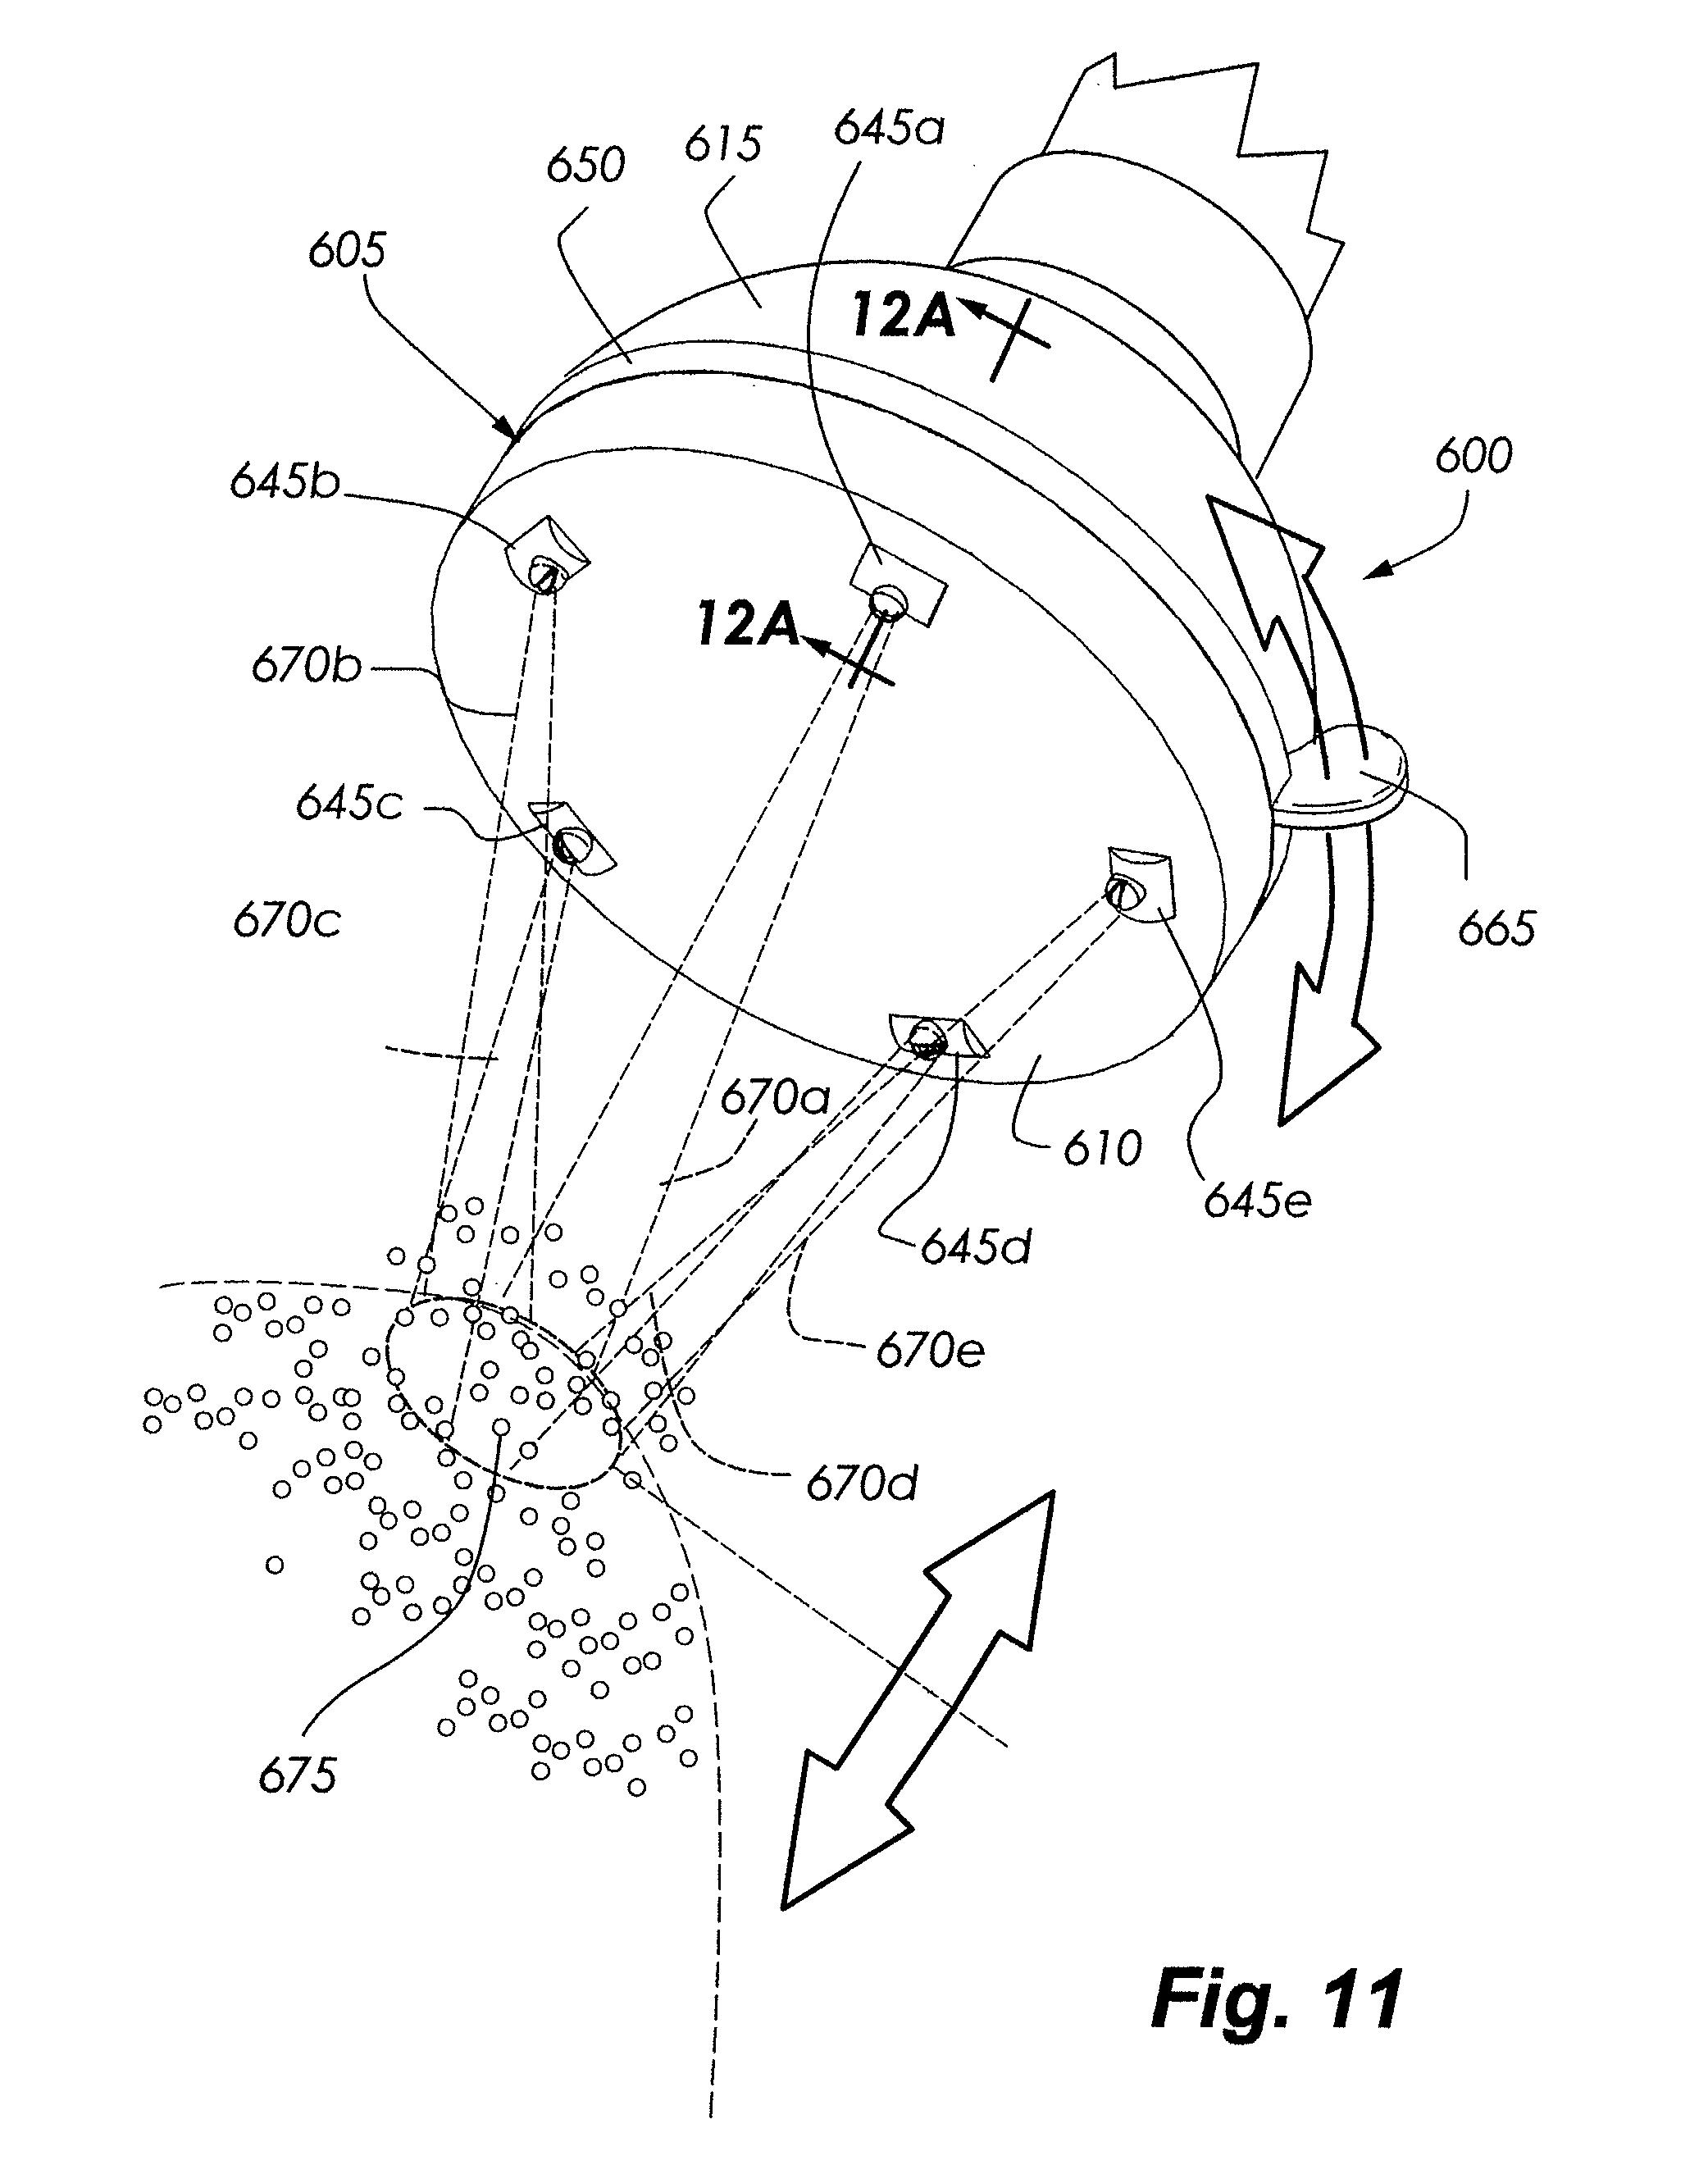 Wiring diagram for massey ferguson 65 the wiring diagram